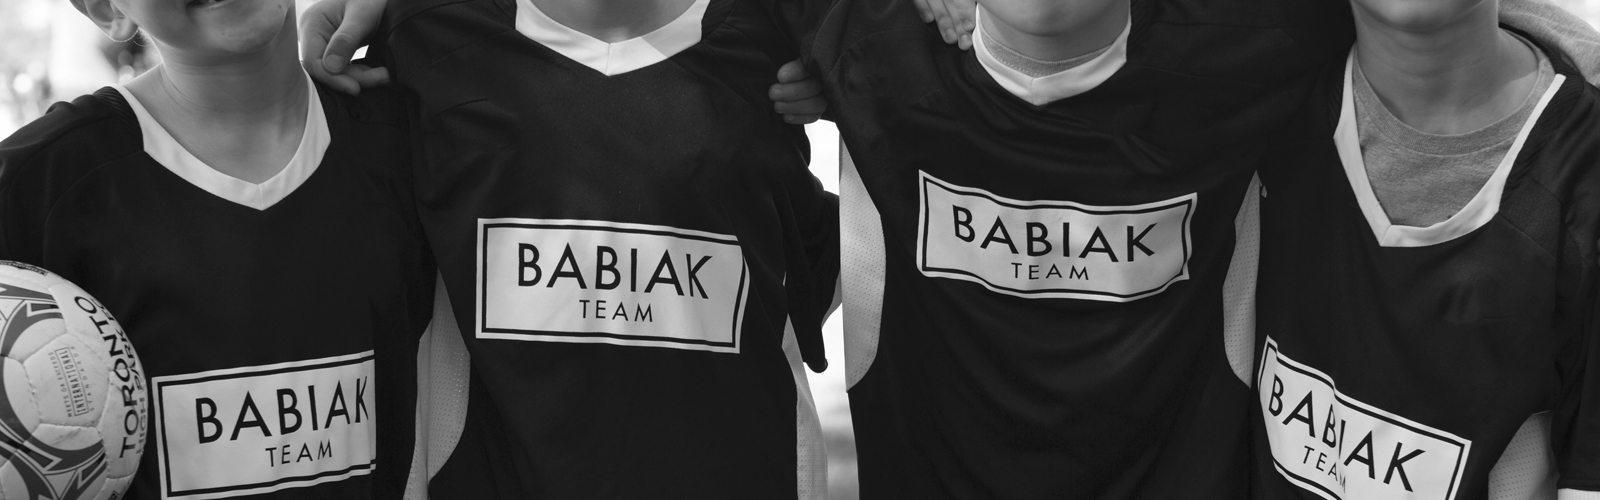 Theodore Babiak Team